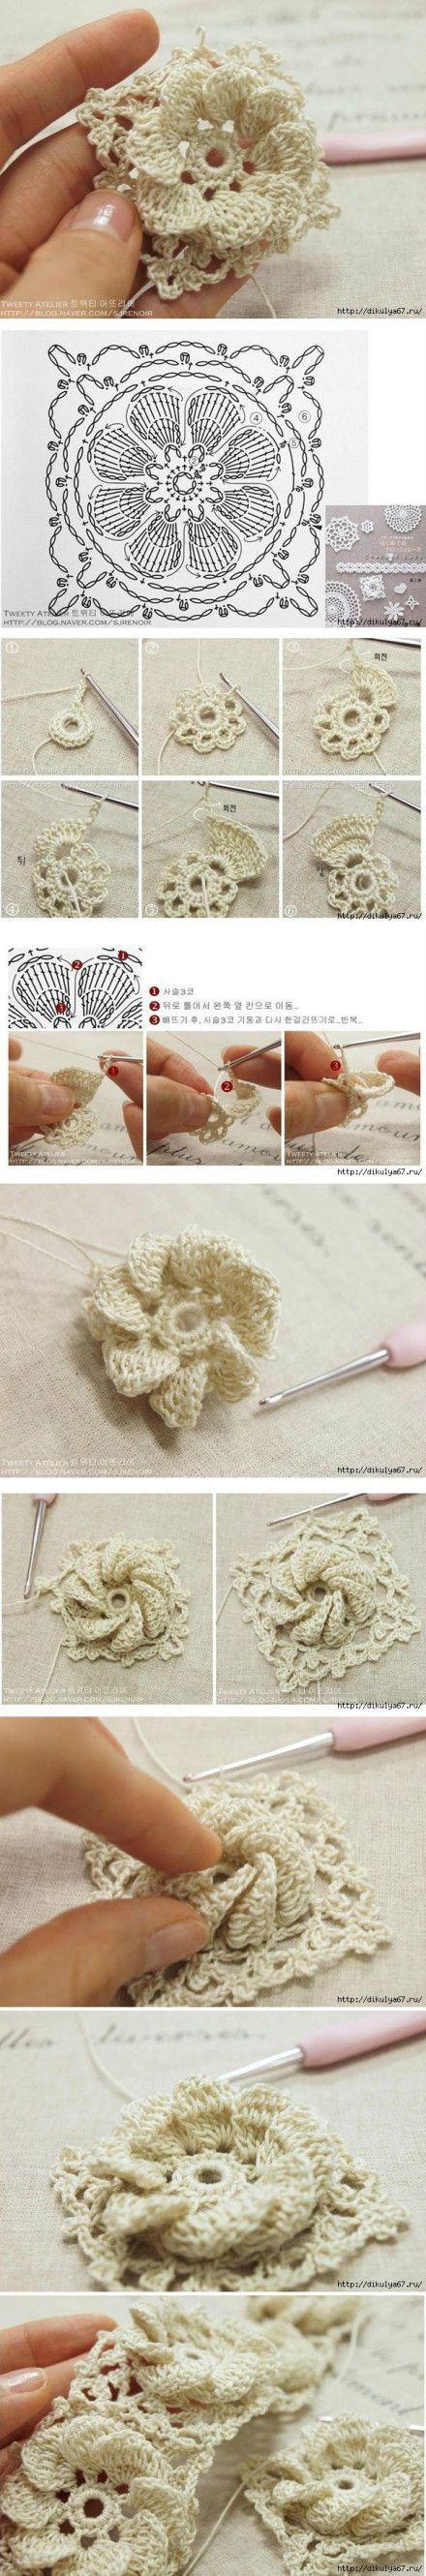 Luty Artes Crochet: Artes em Crochê.